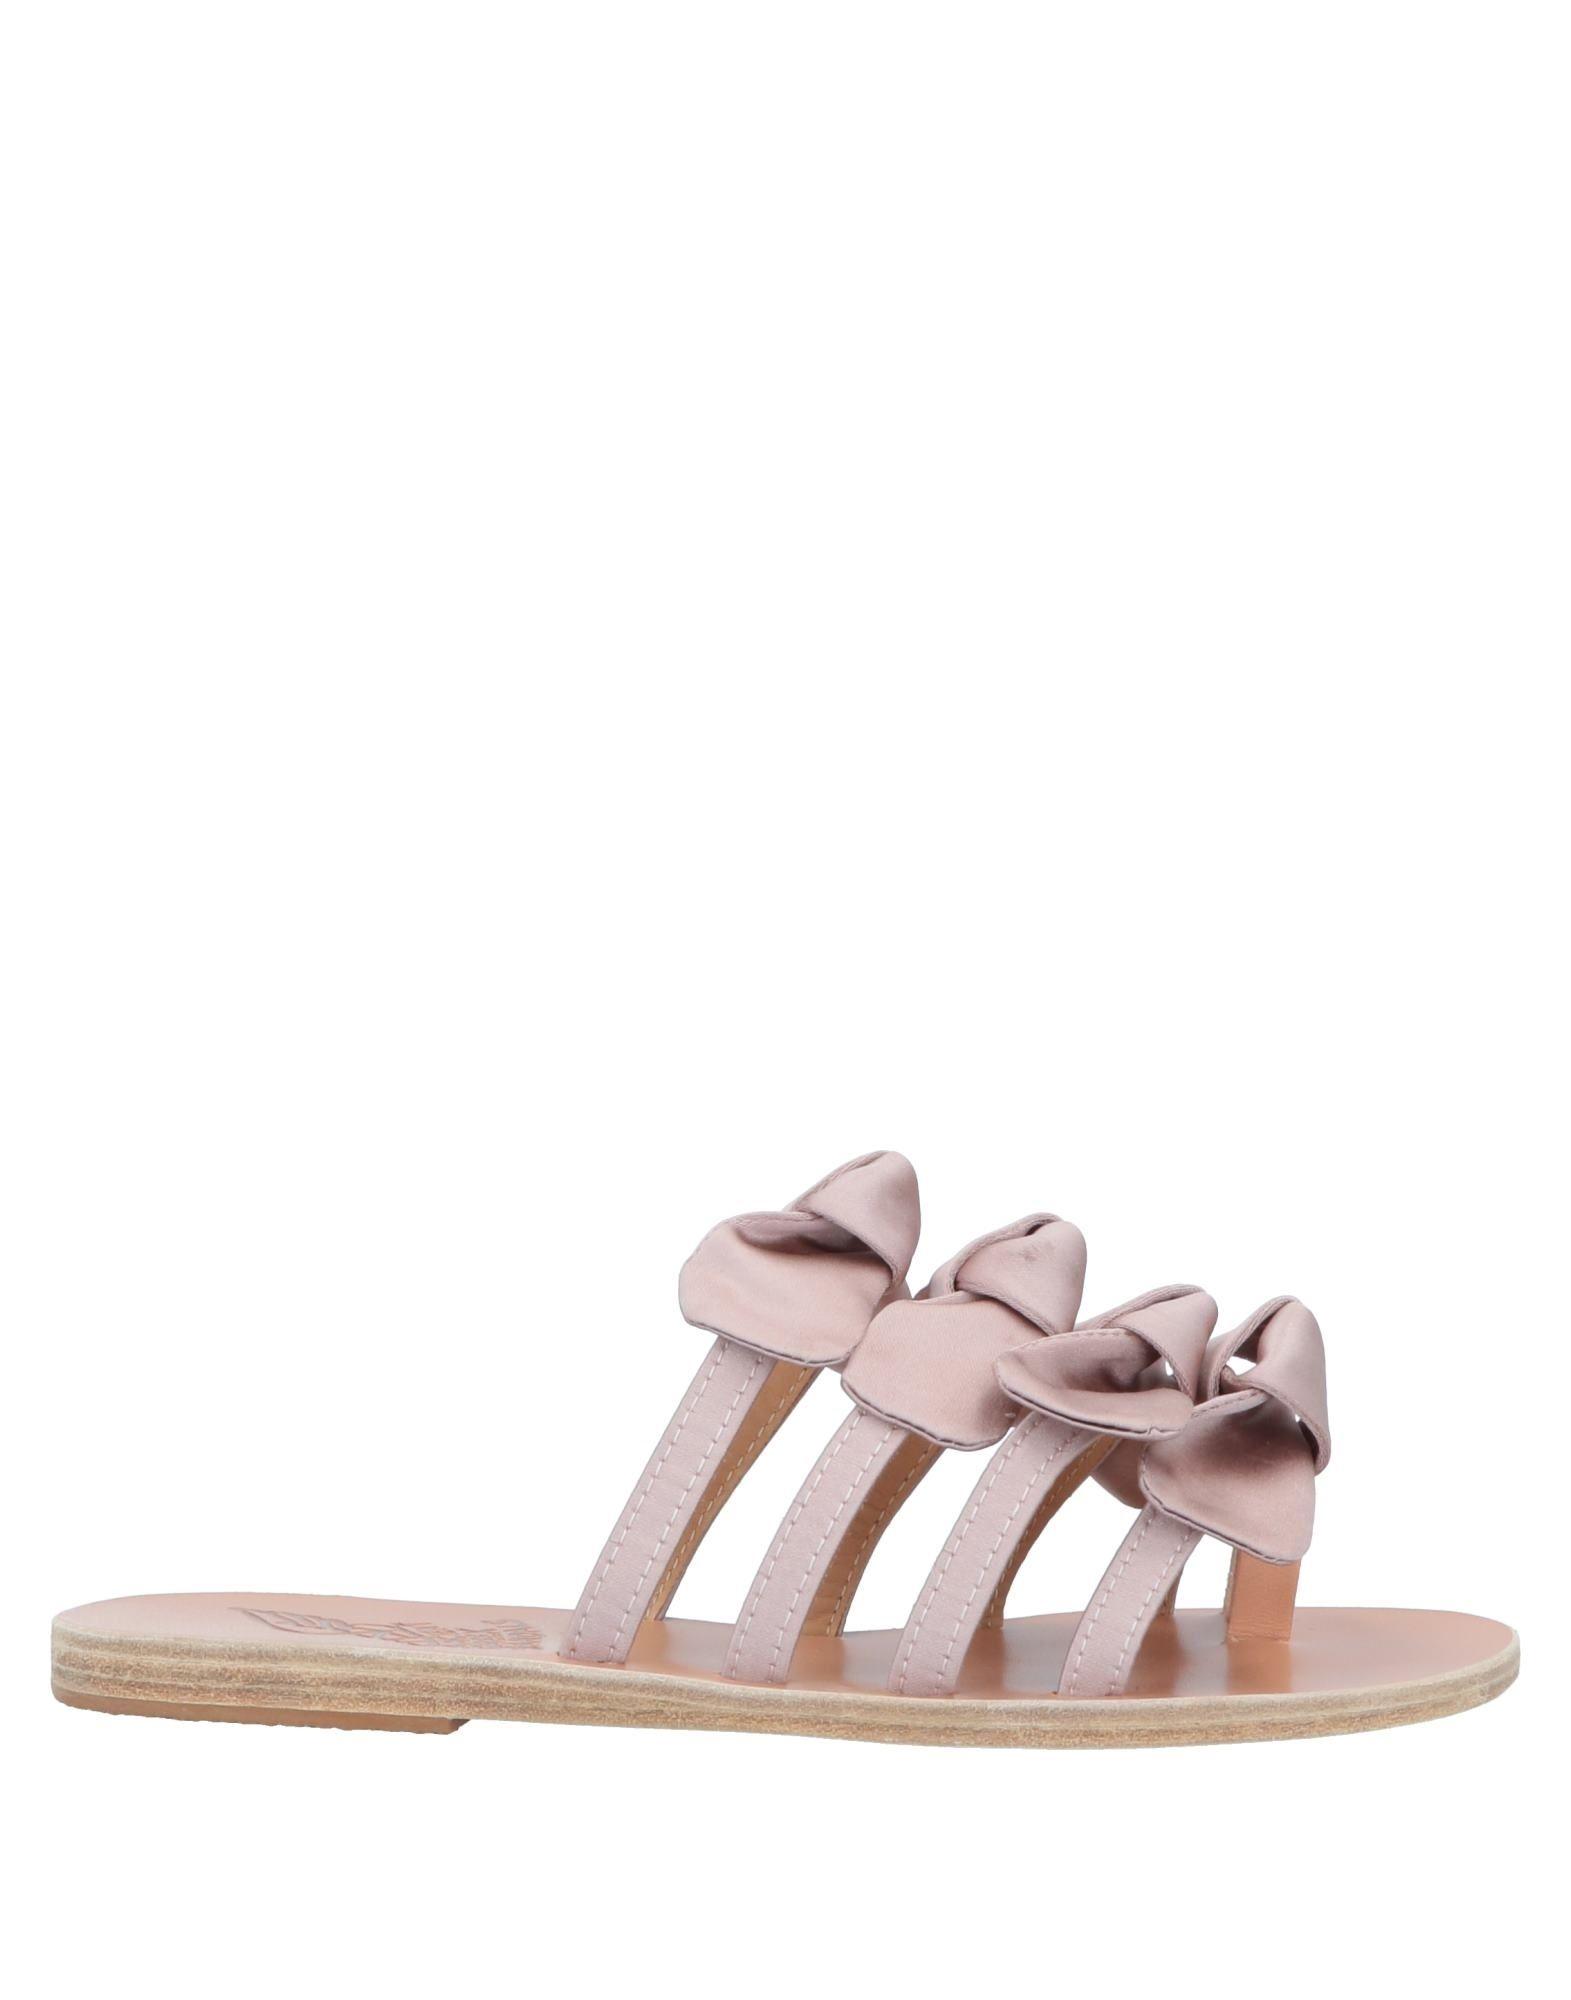 ANCIENT GREEK SANDALS Вьетнамки woman high heels sandals gold chains sandals lady high heels sandals sexy open toe pumps cut outs dress nightclub shoes b160